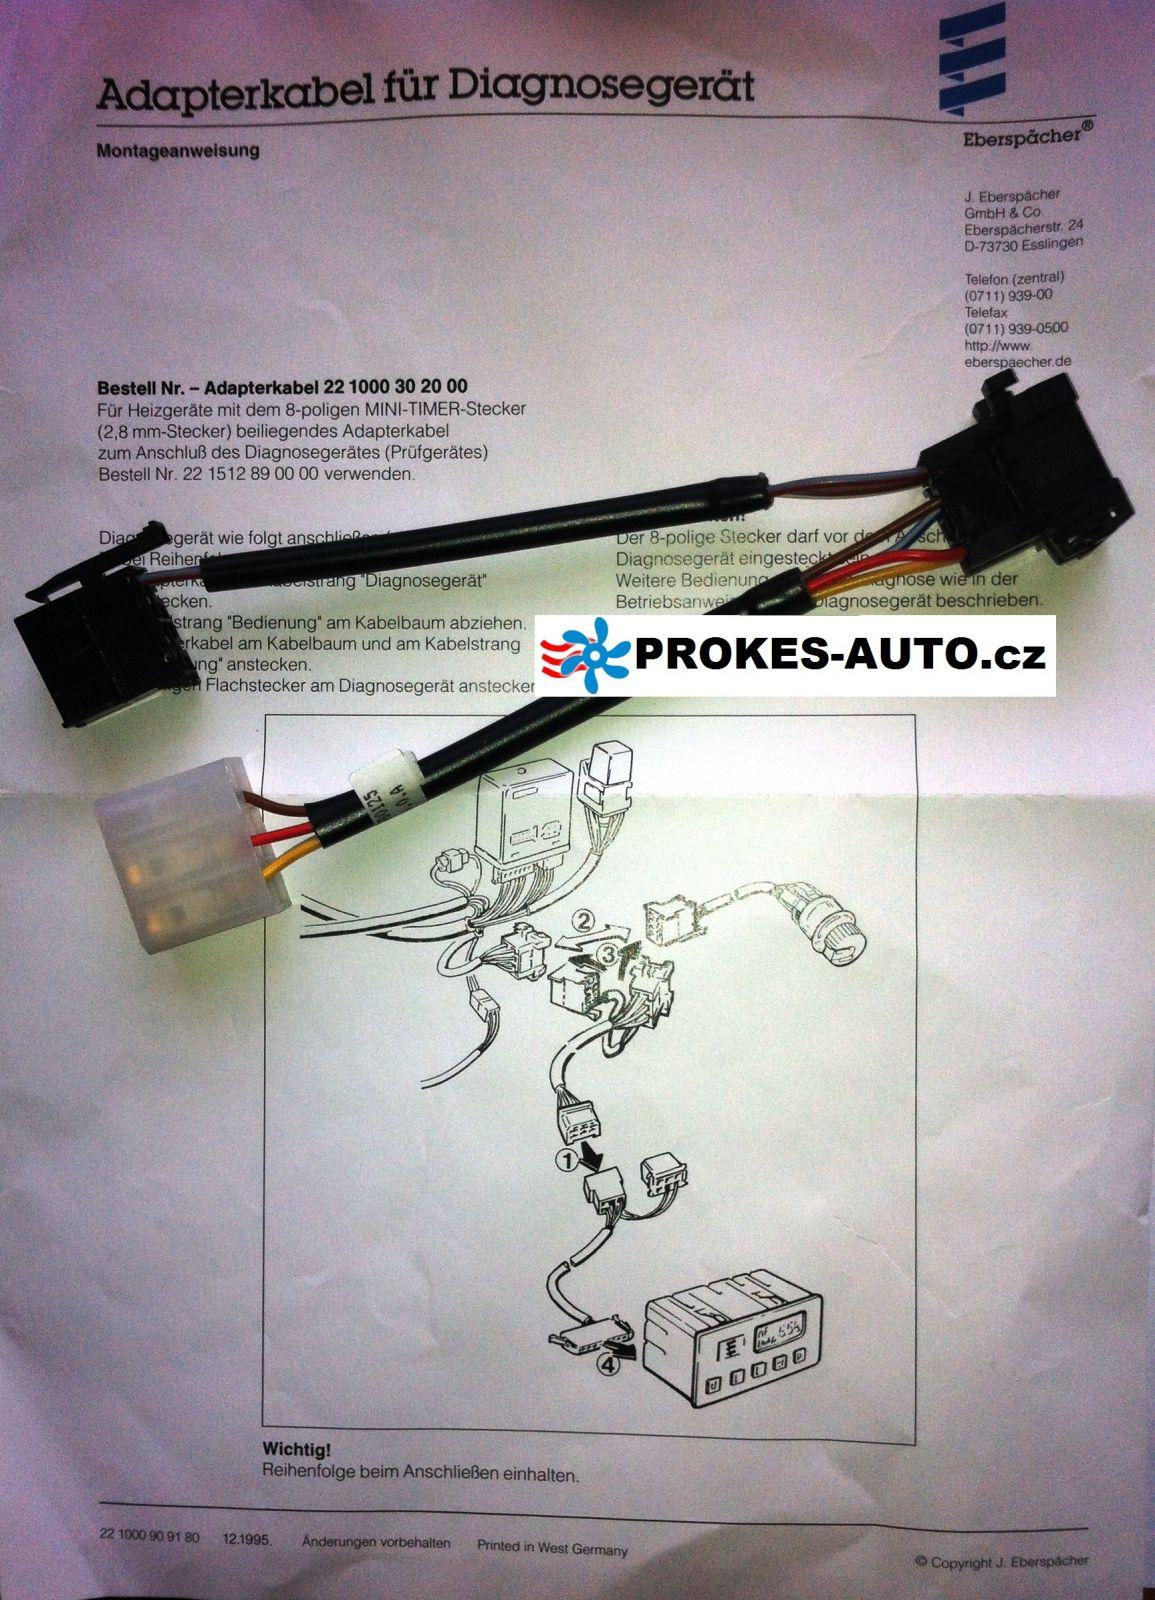 Adaptér diagnostický kabel k topení D1LC / D3LC / D3LP / D5LC 221000302000 Eberspächer